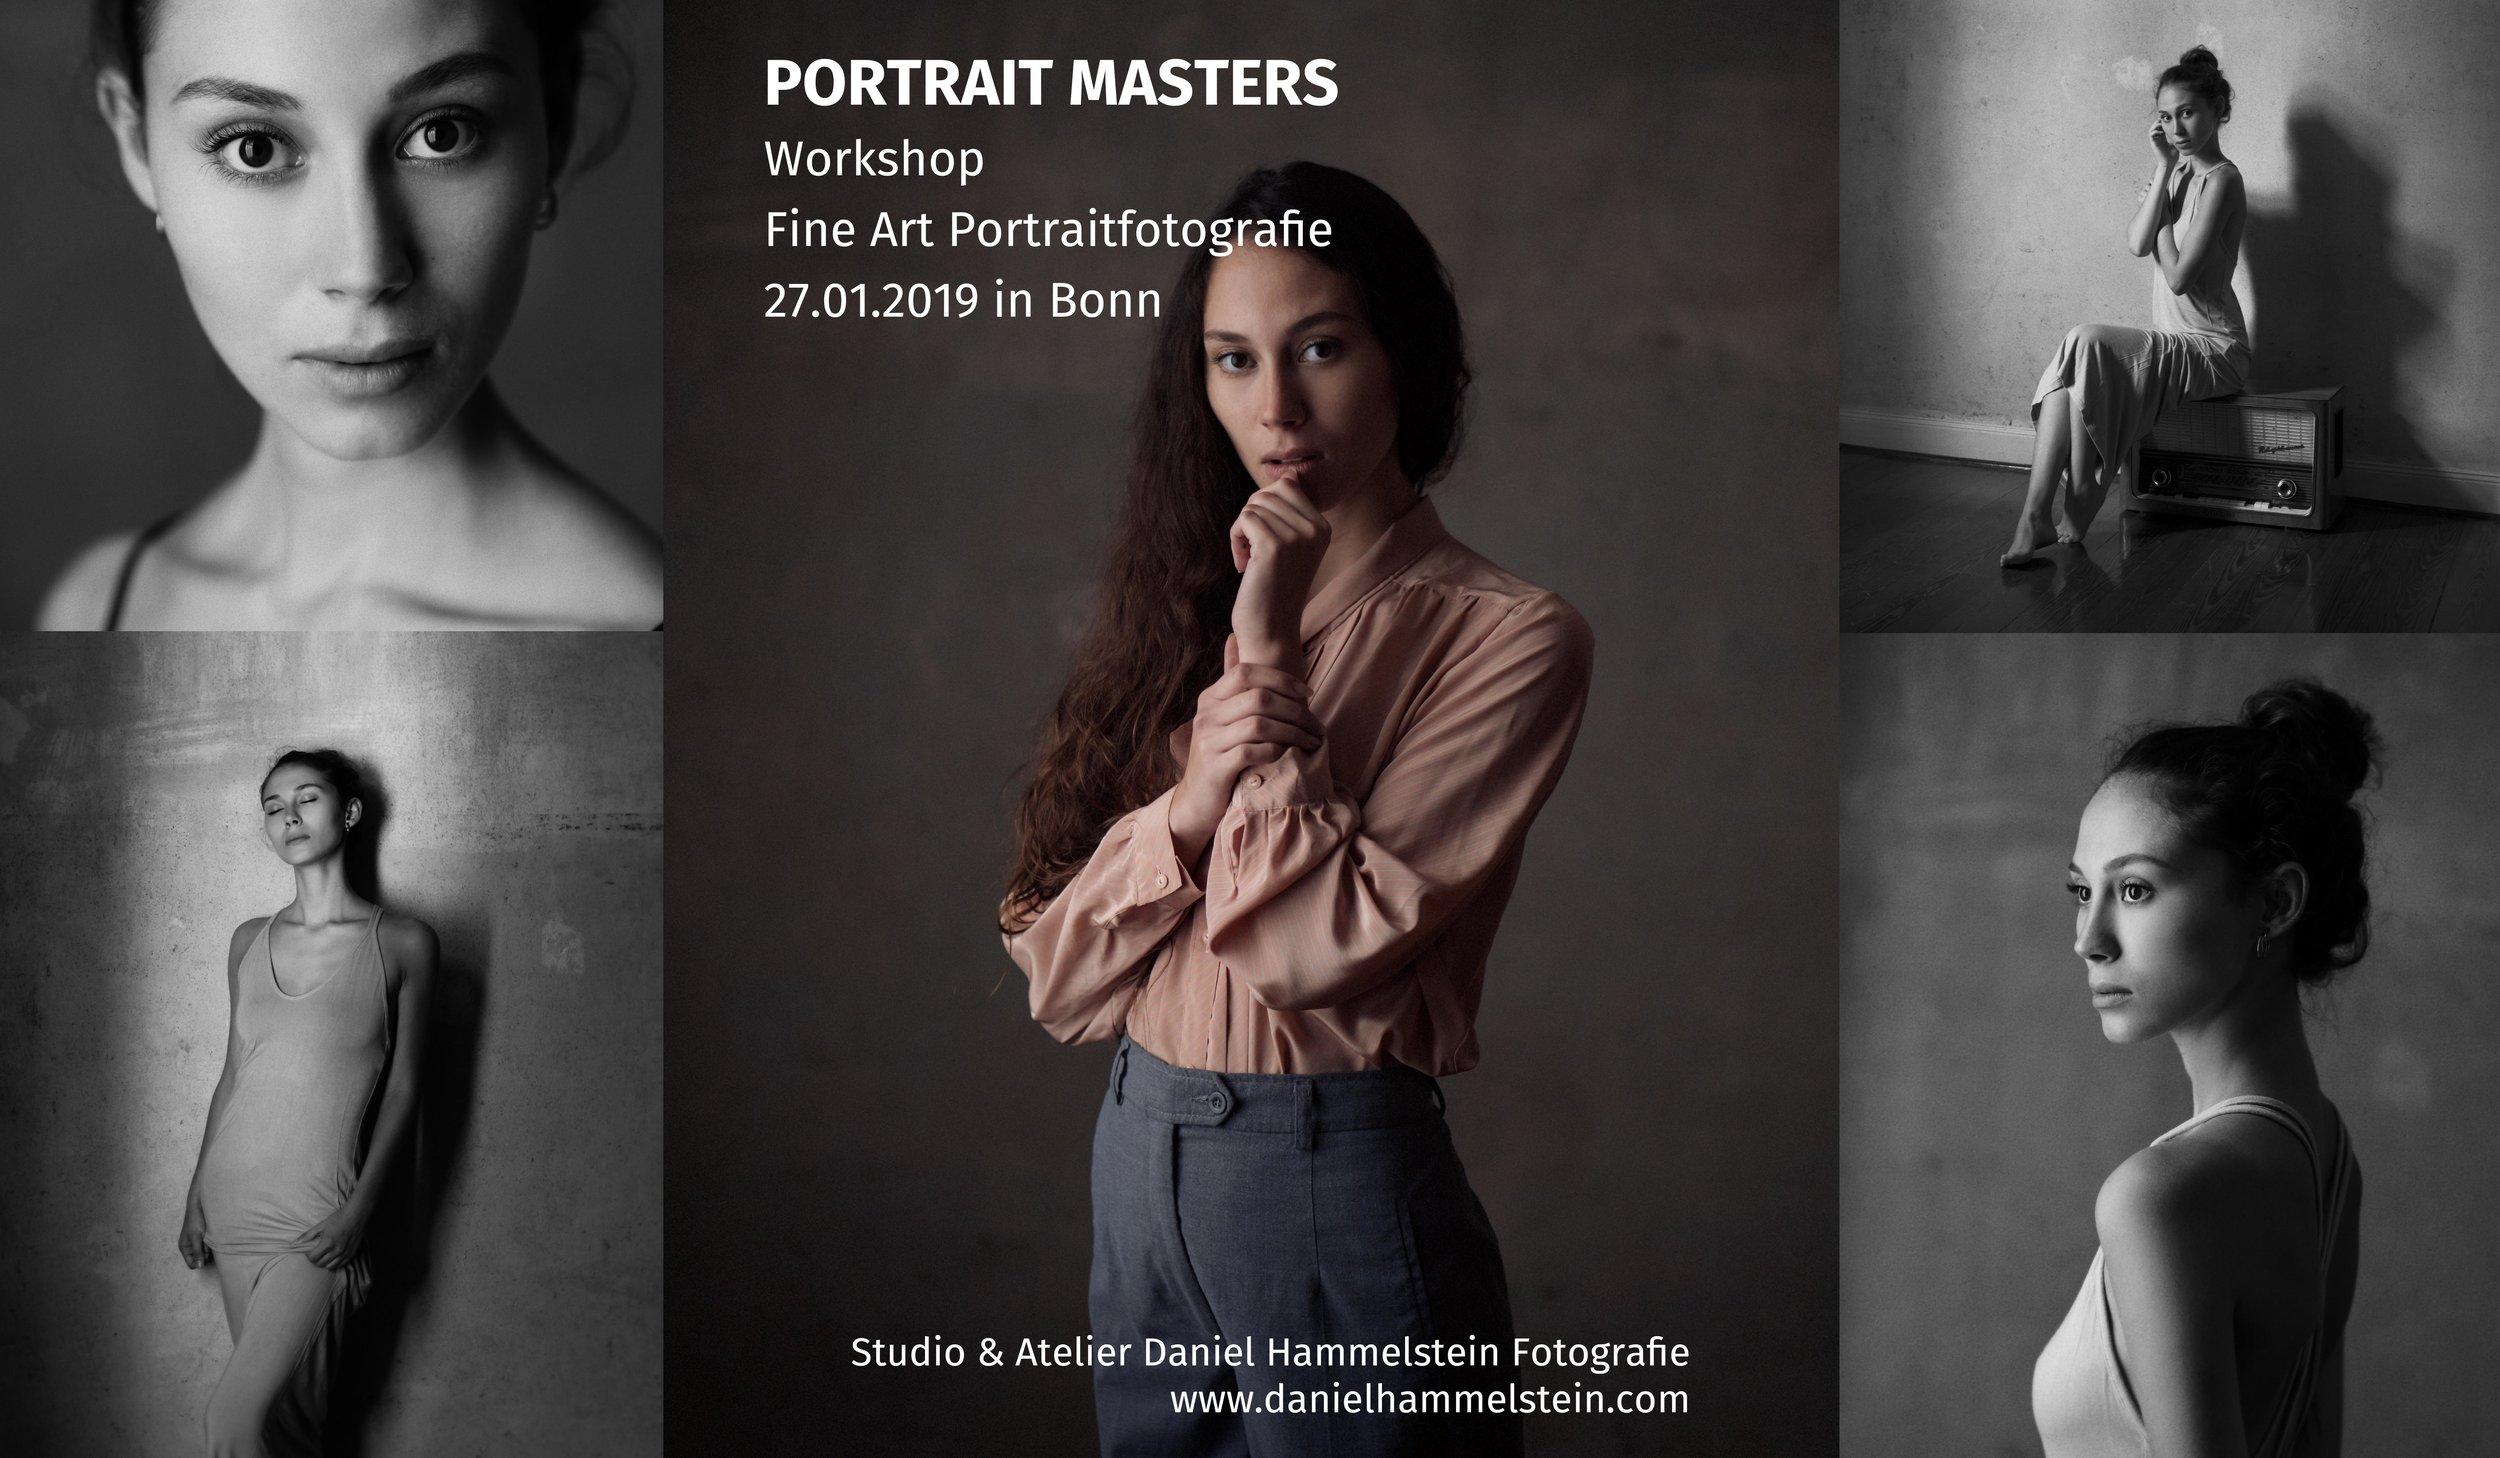 Portrait Workshop Portraitfotografie Schwarzweissfotografie Fotoworkshop Fotokurs Bonn Köln Düsseldorf NRW Januar 2019.jpg